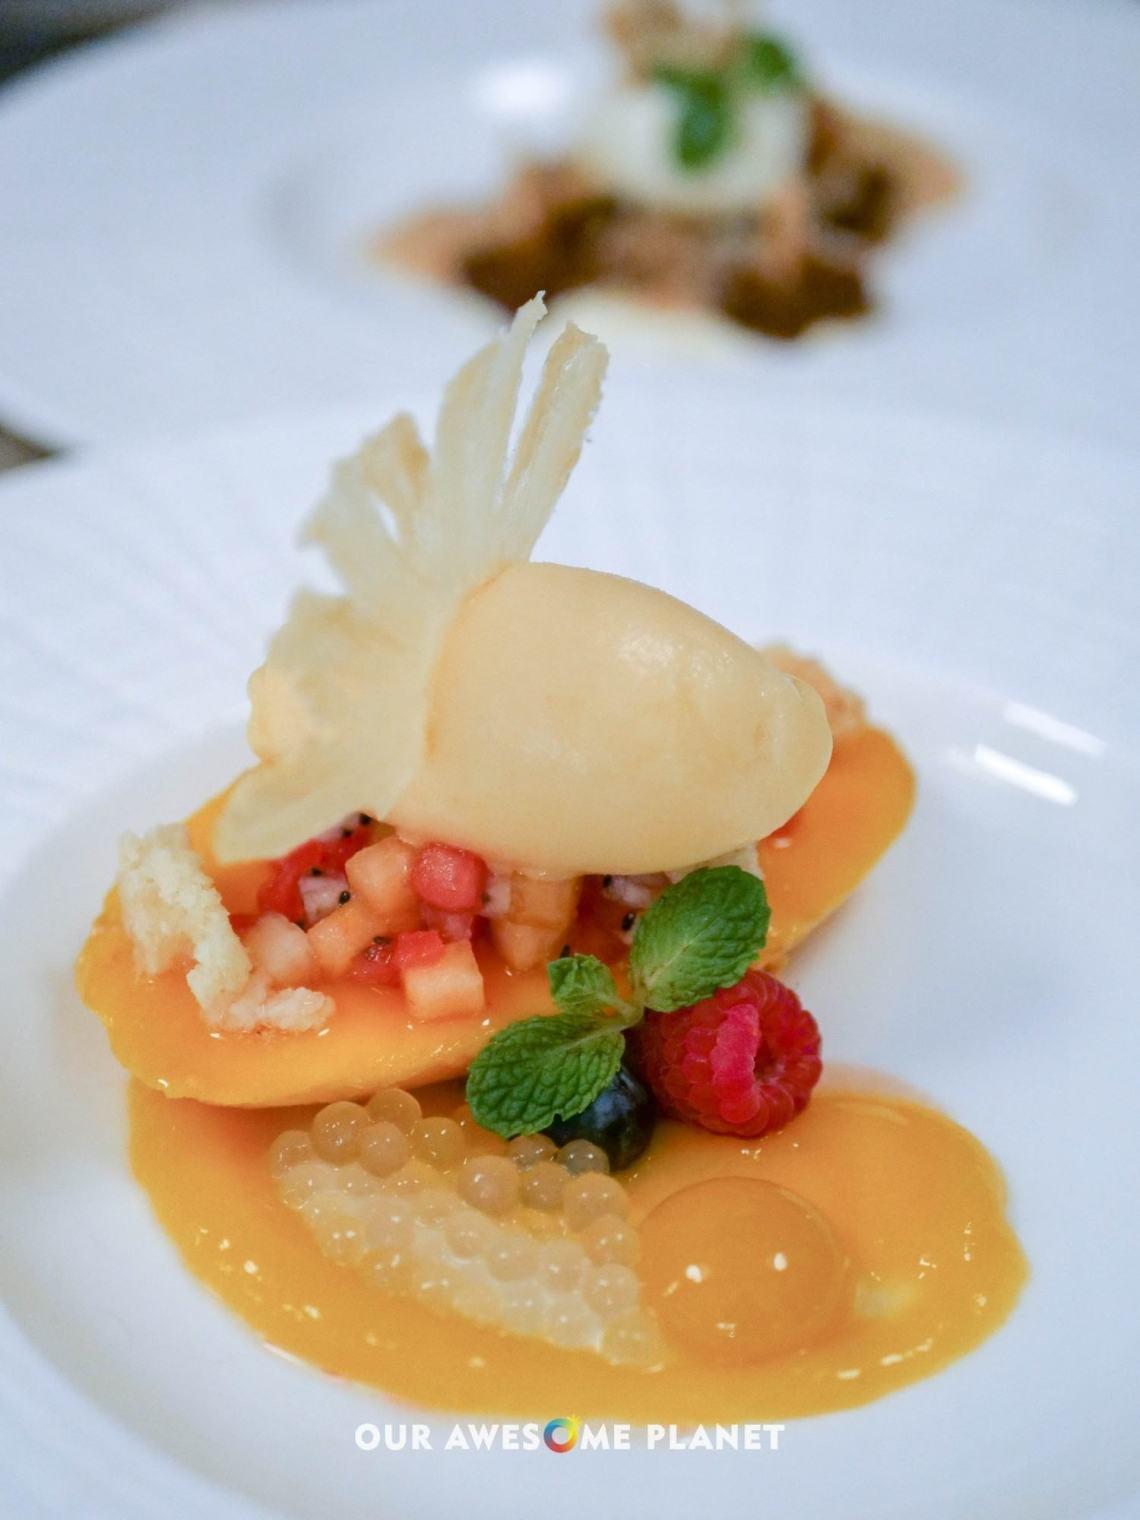 Roasted Mango(₱360). Tropical fruit sorbet, graham crumble, mango sphere, tapioca pearls